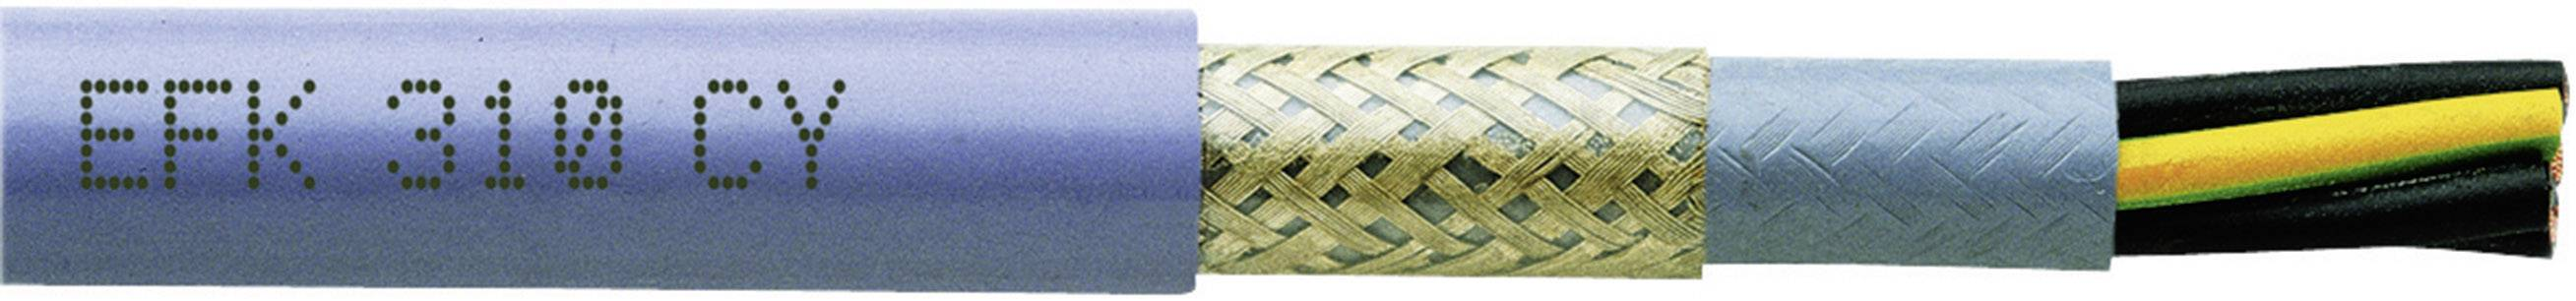 Tažný kabel Faber Kabel EFK 310 CY 310 CUL EFK PVC/PVC/C/PVC (035475), 7x 0,5 mm², PVC, Ø 11,3 mm, stíněný, 1